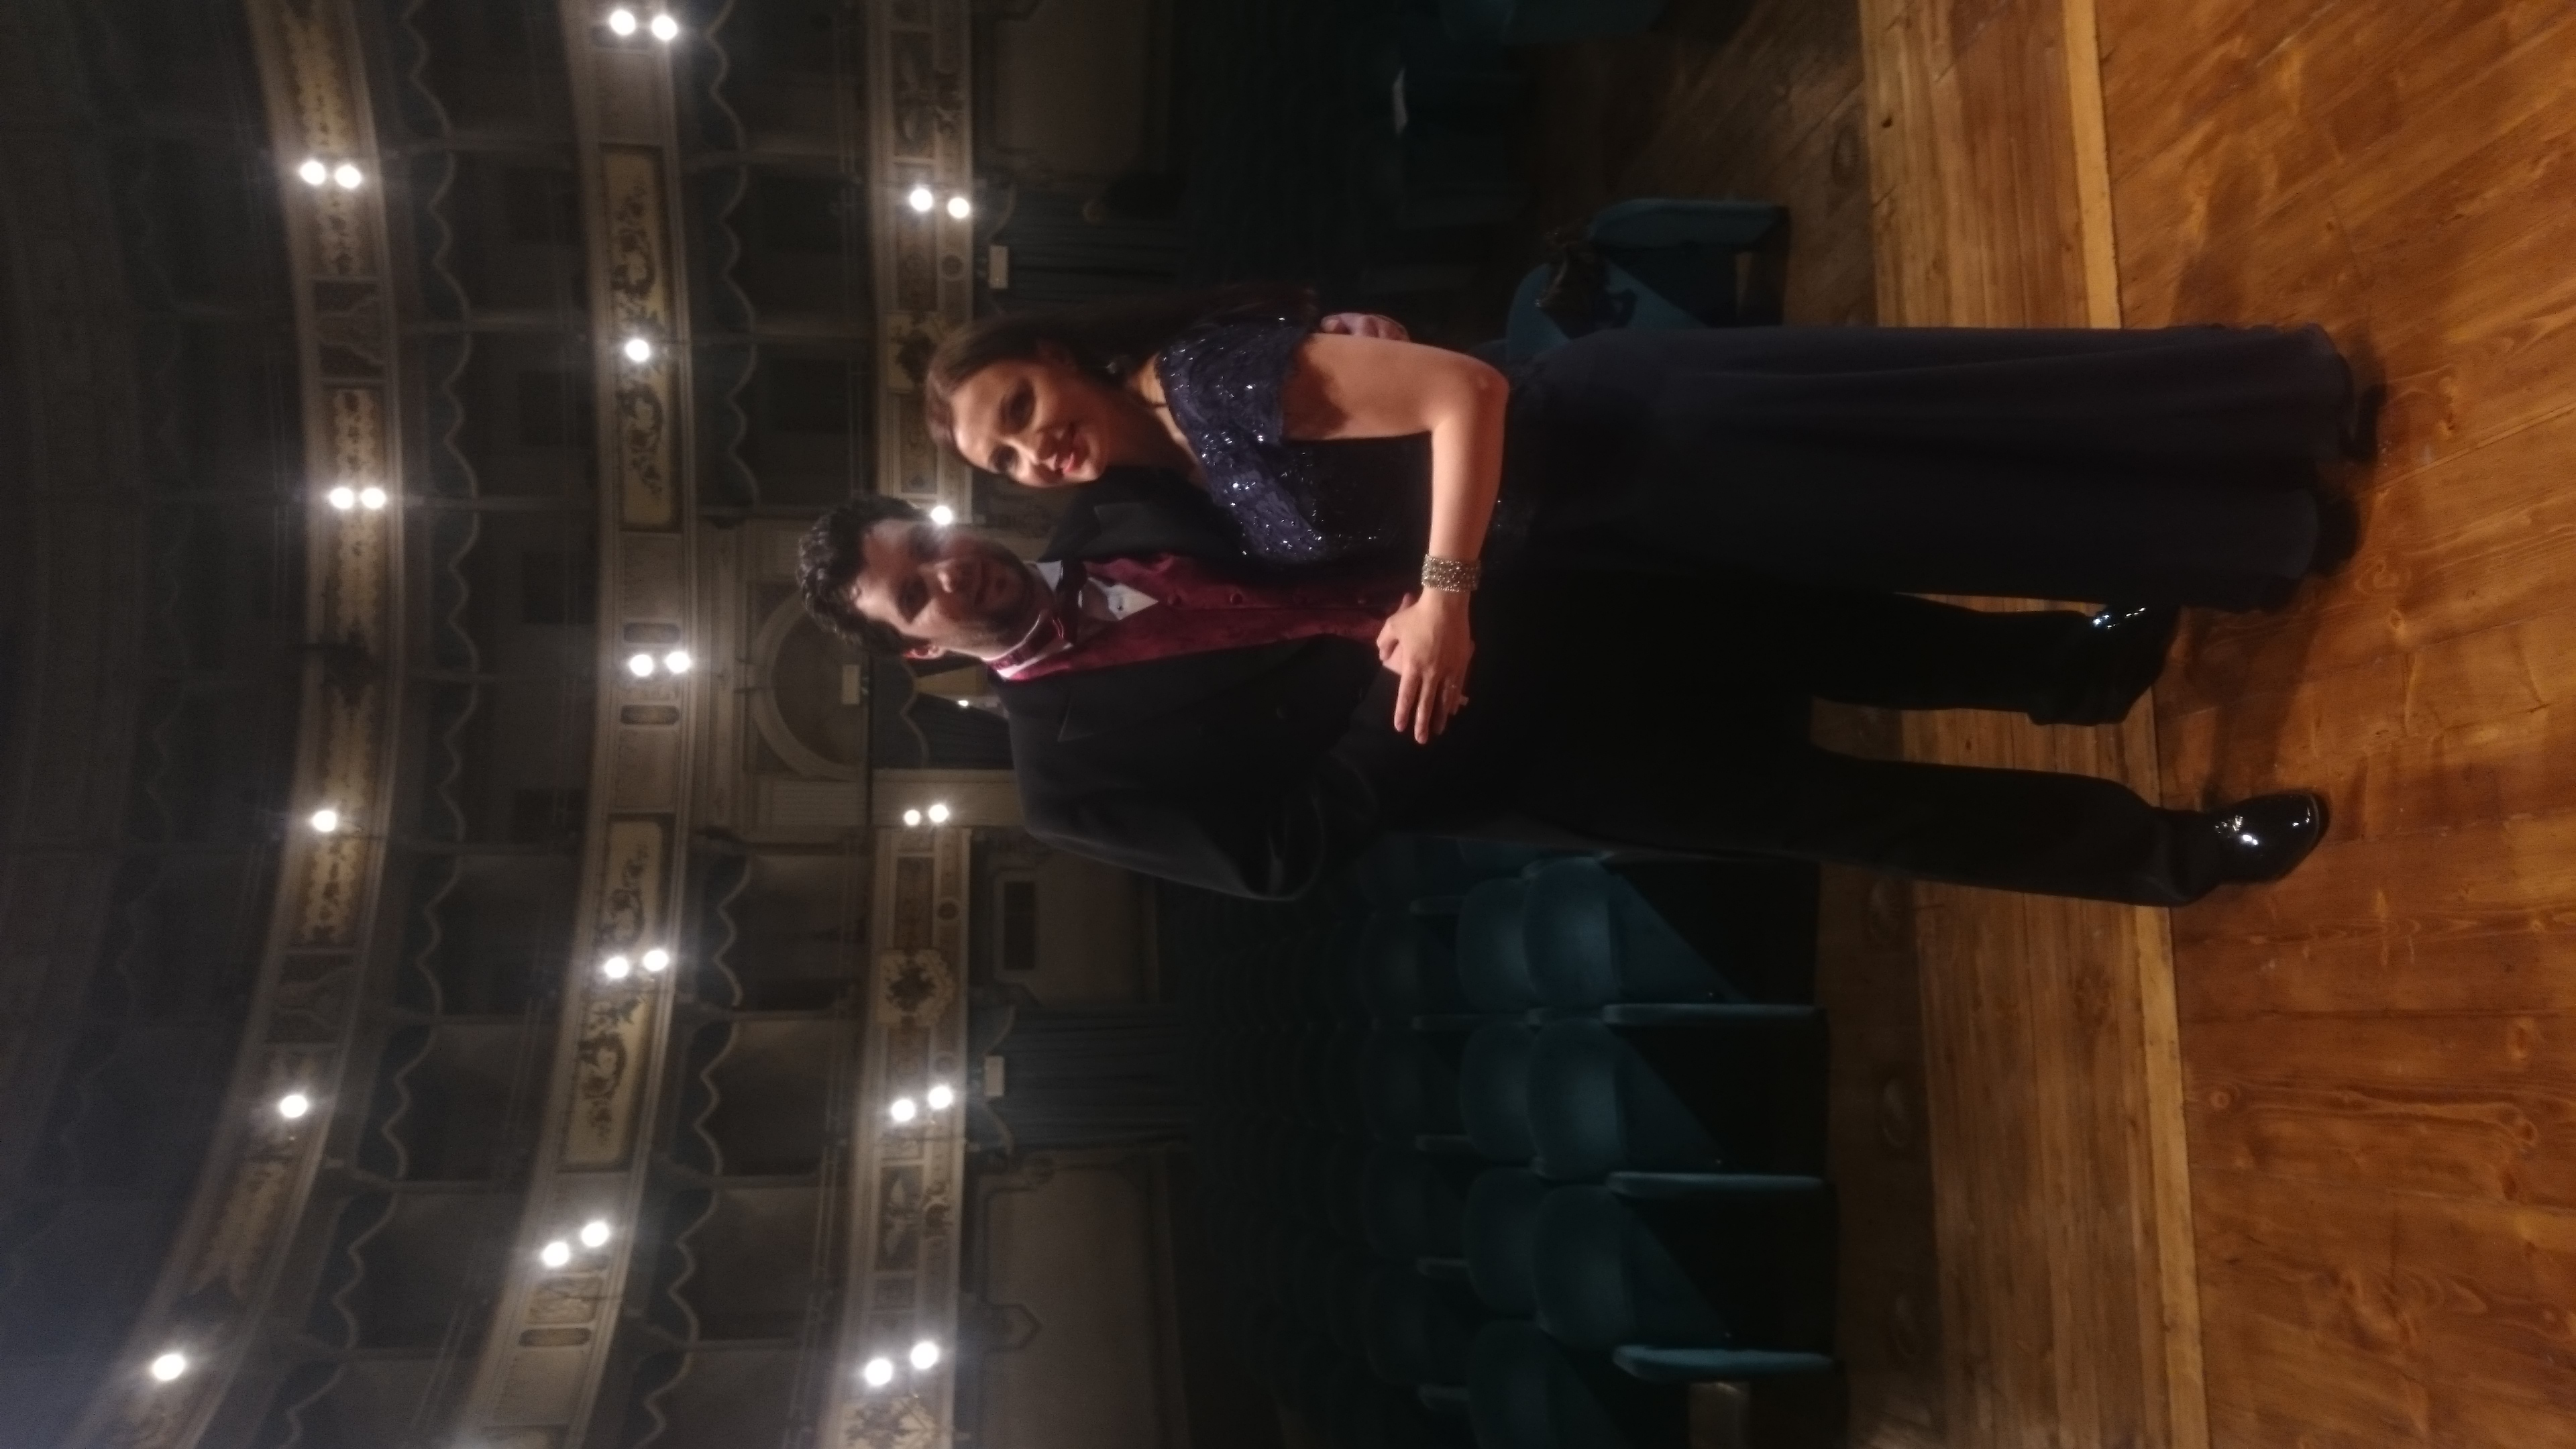 Teatro la Nuova Fenice concert